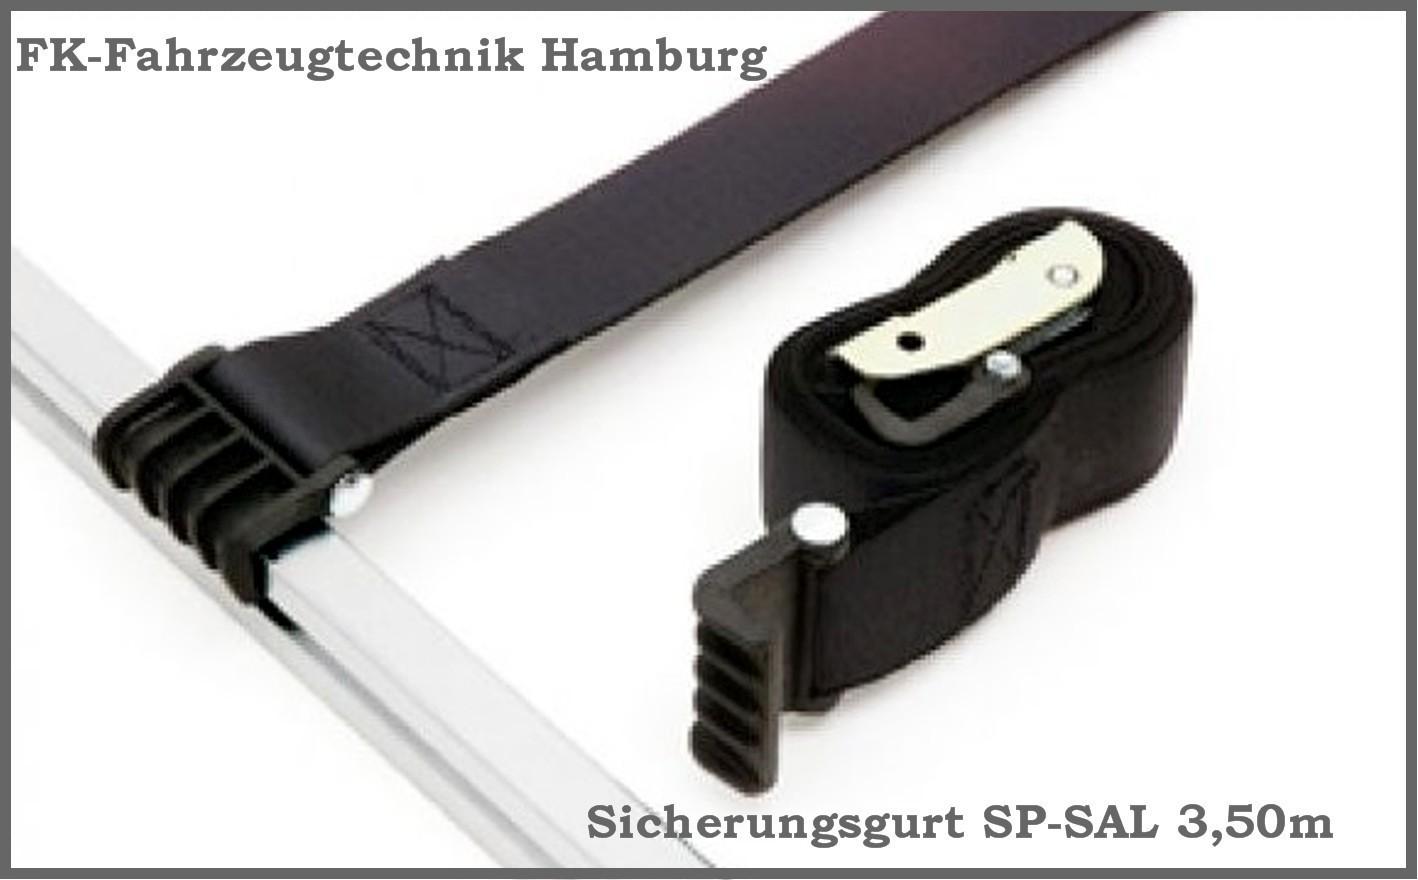 Equipment-Shop Kasper-Umzüge Hamburg Profi-Equipment